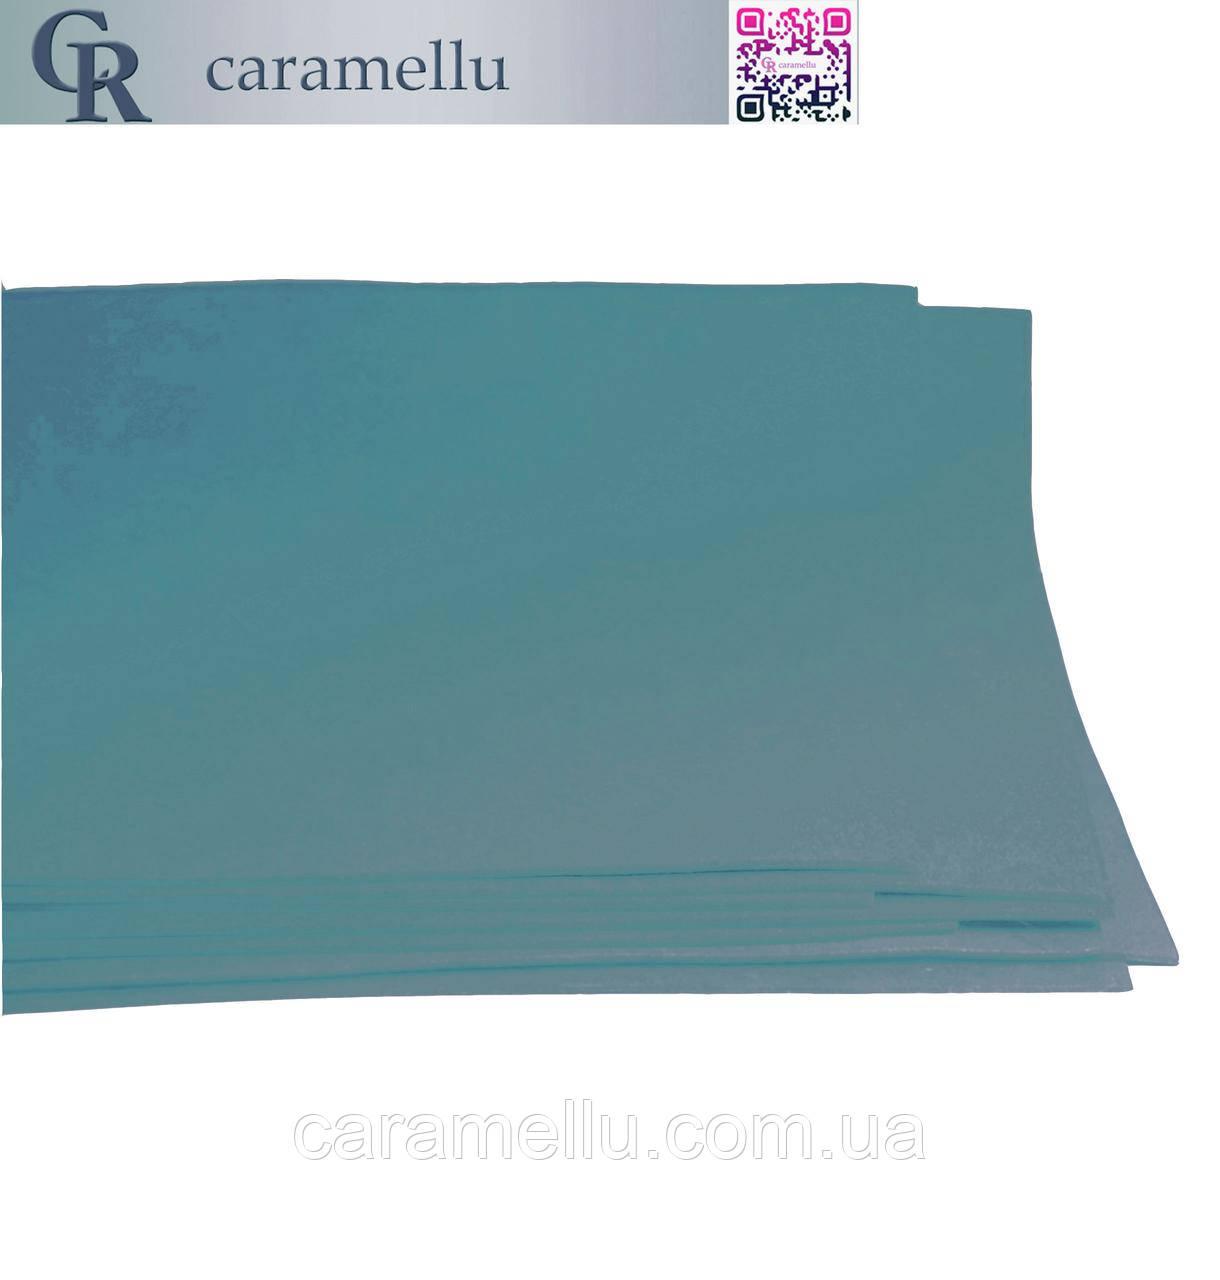 Фоамиран иранский 167, Темно-голубой, 1мм, 20х30см А4